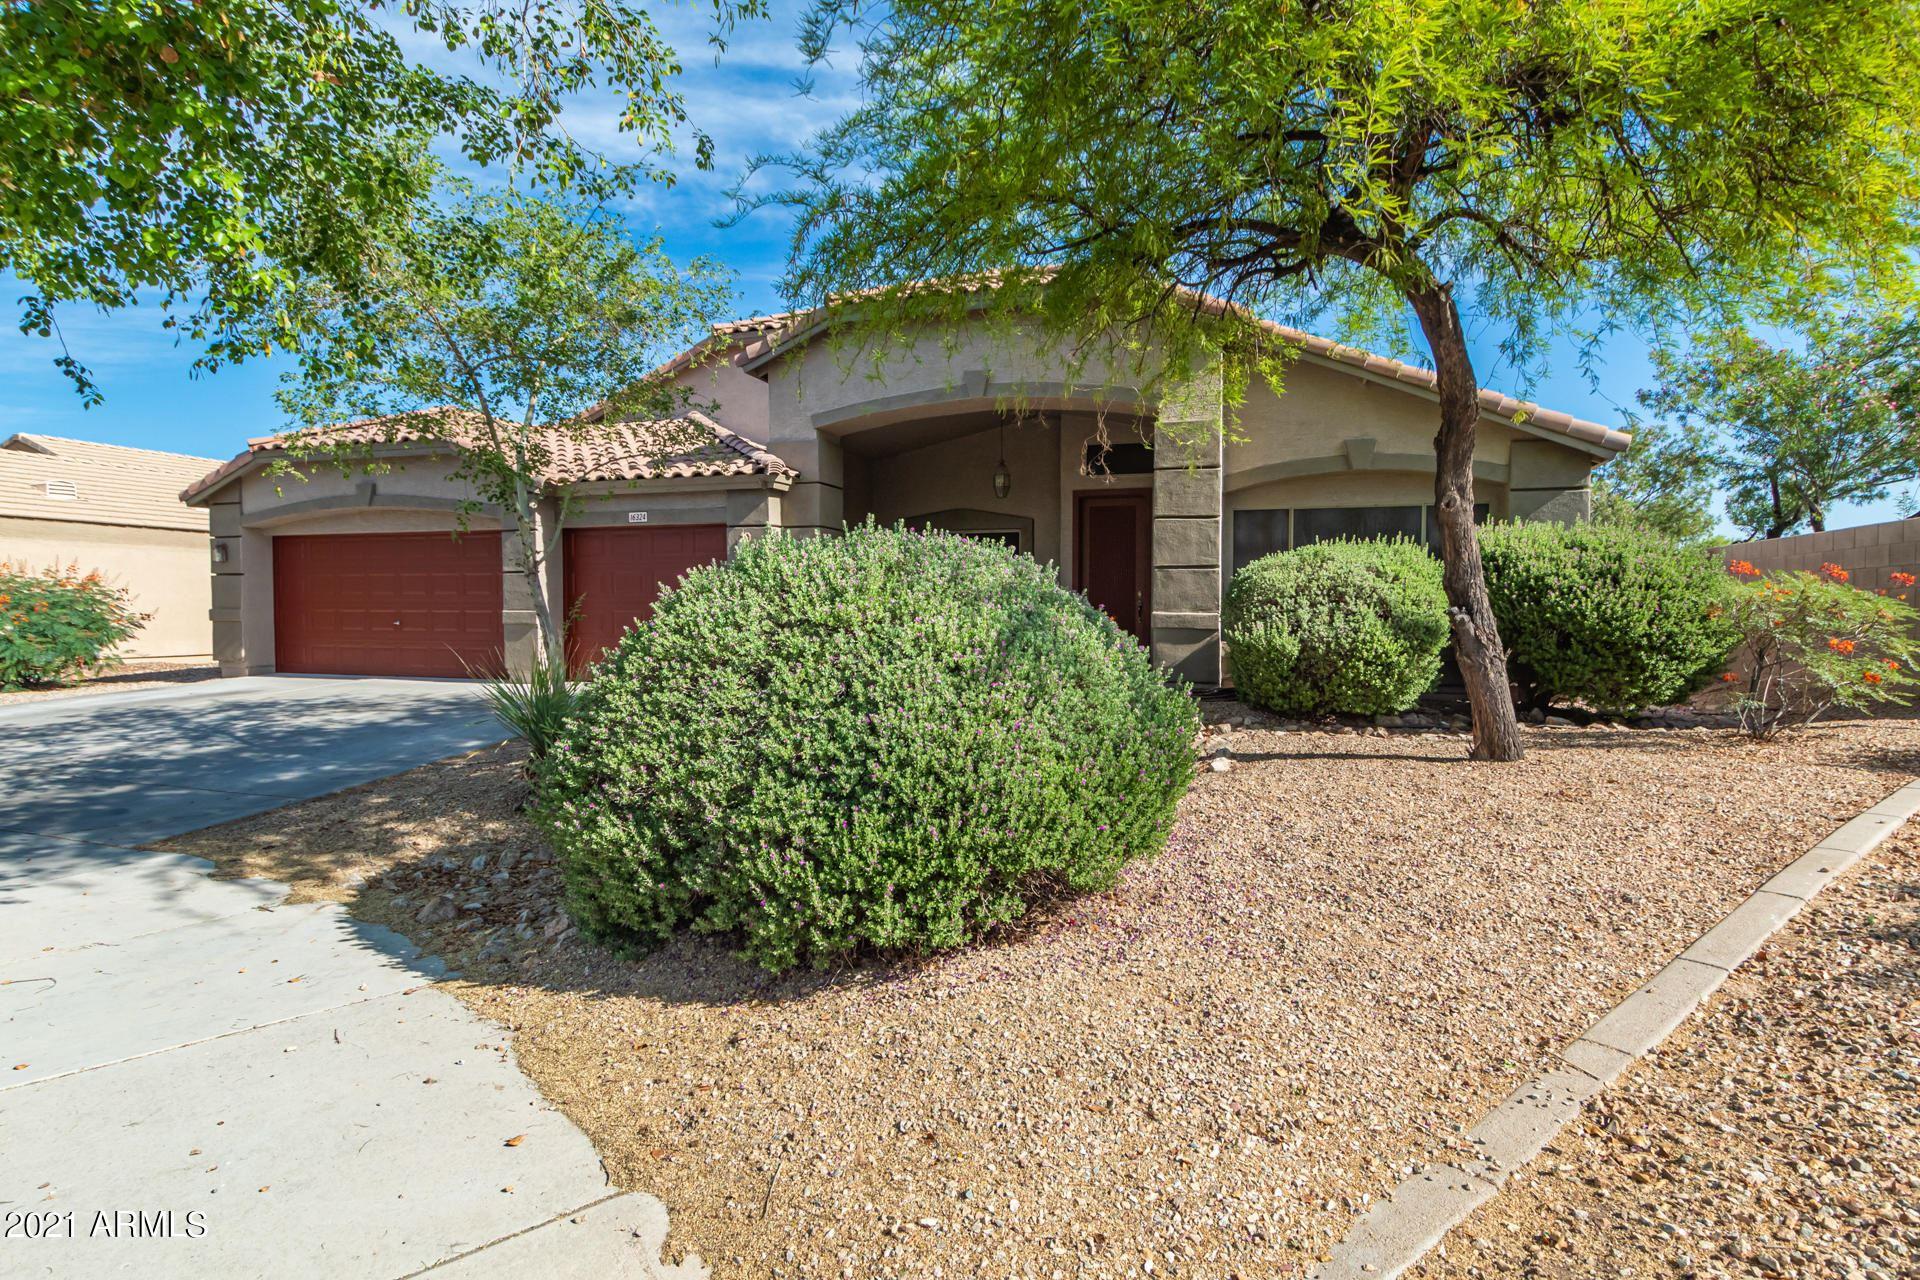 16324 W MCKINLEY Street, Goodyear, AZ 85338 - MLS#: 6233233